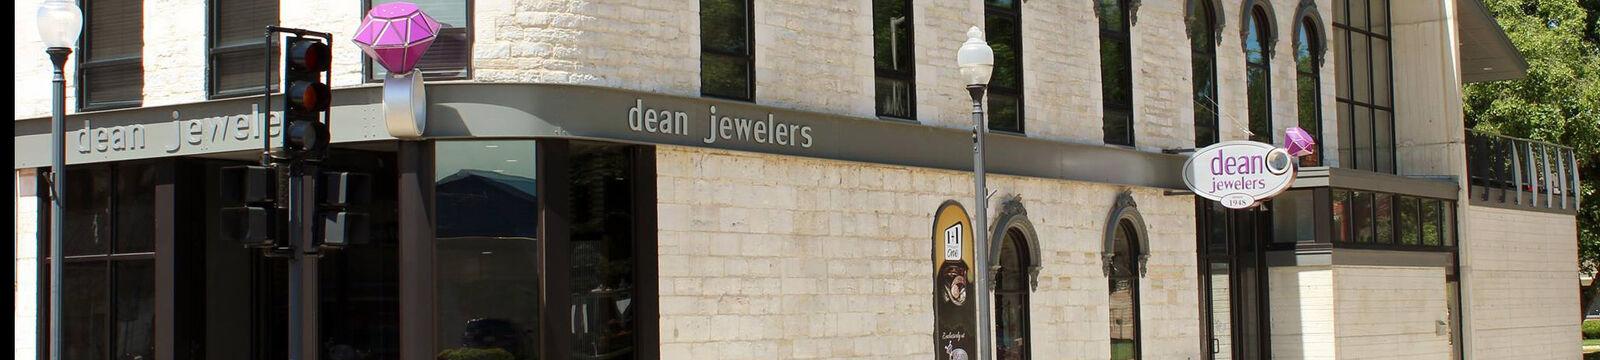 Dean Jewelers